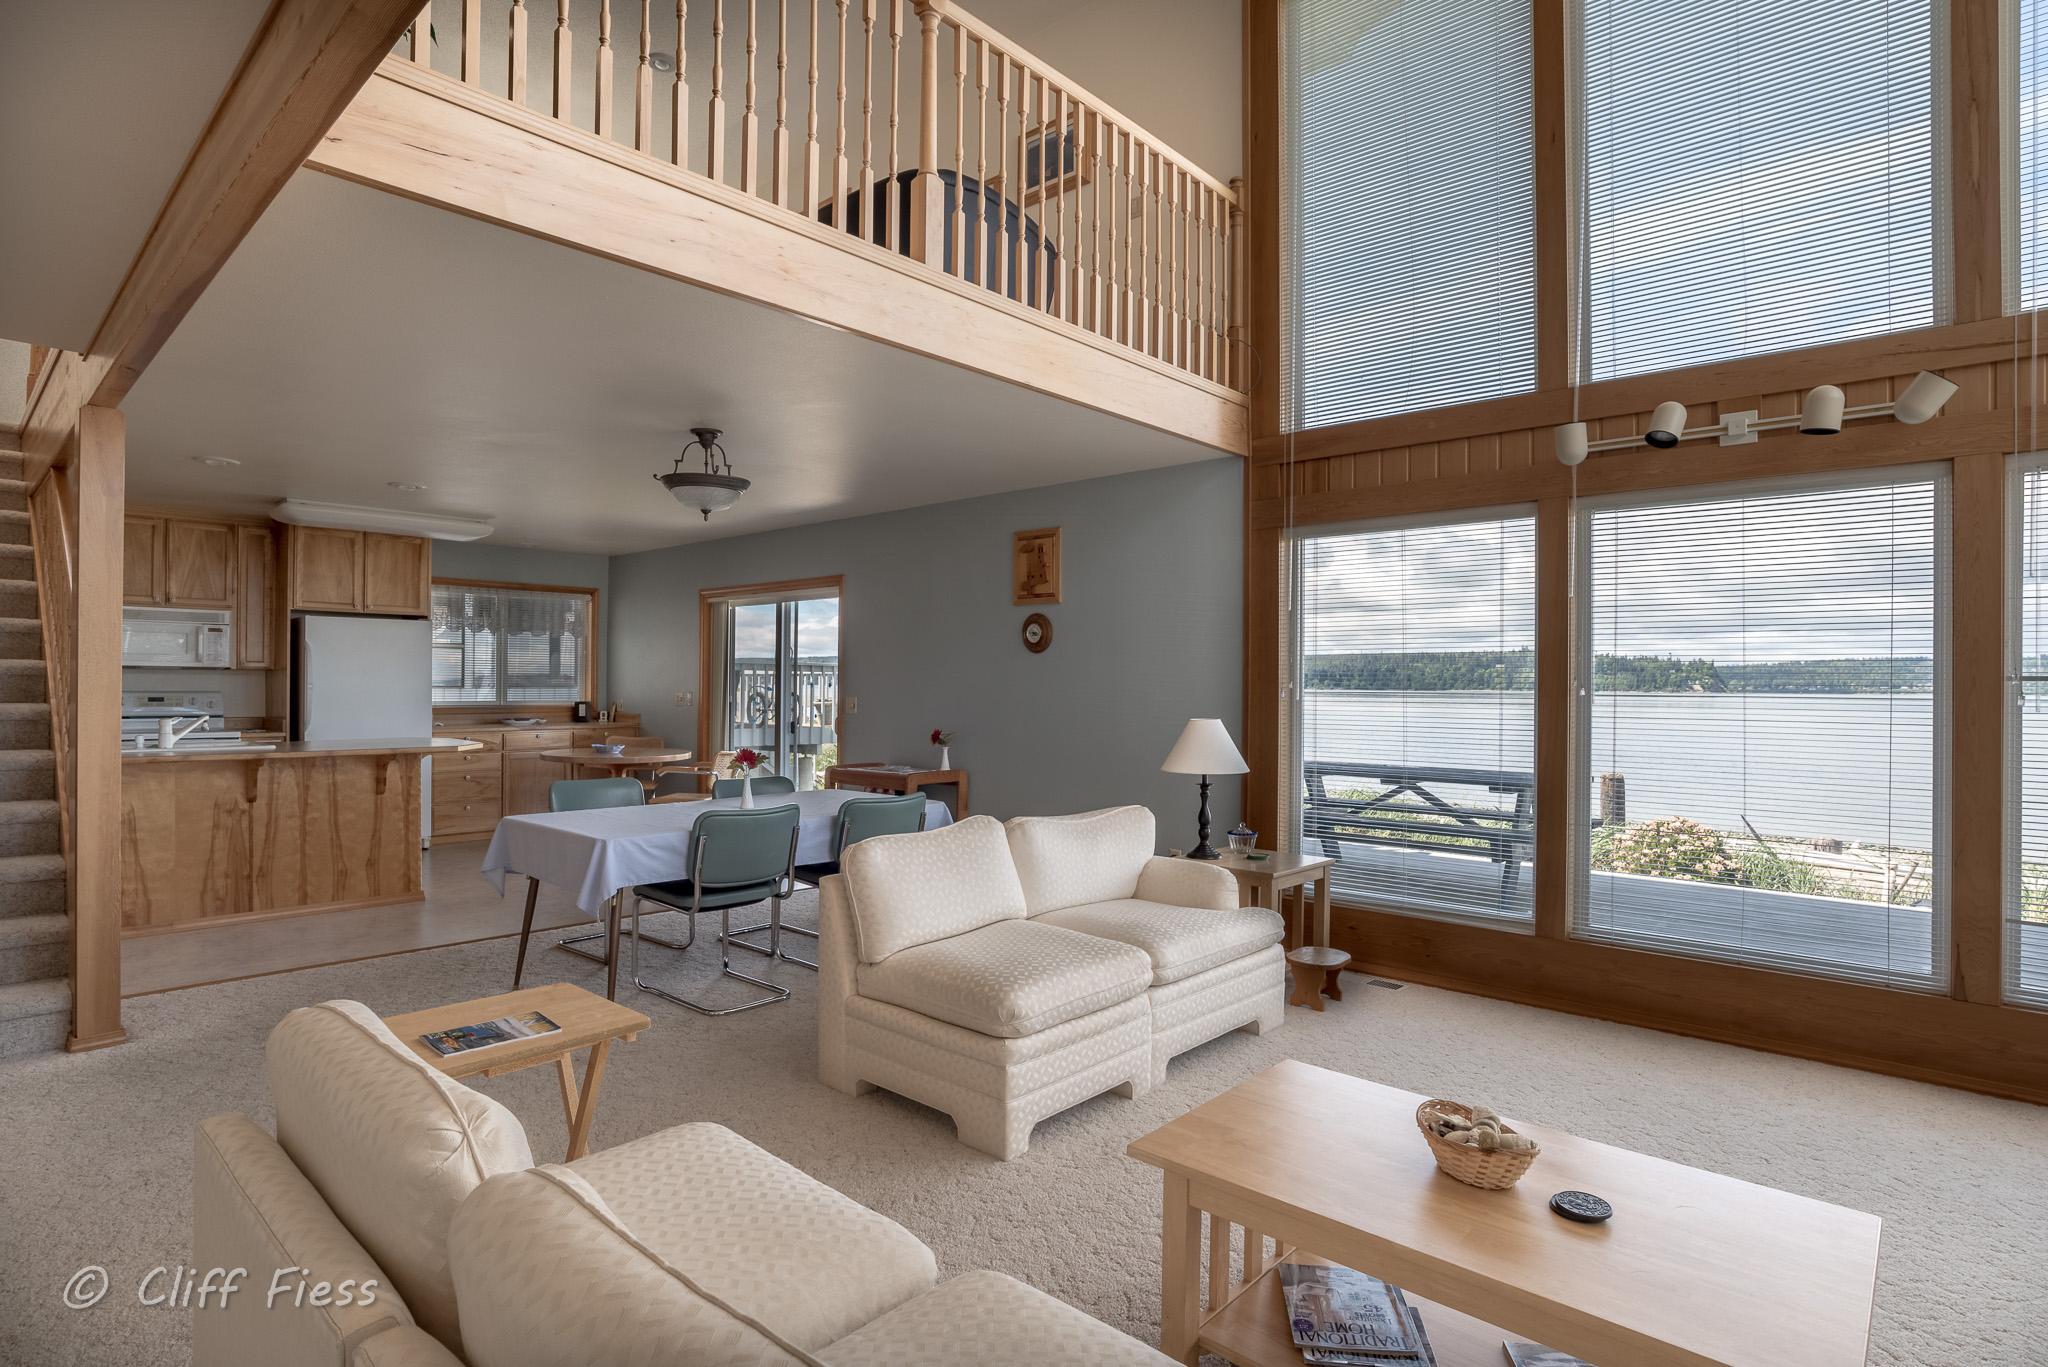 Living Room of a Hansville Residence